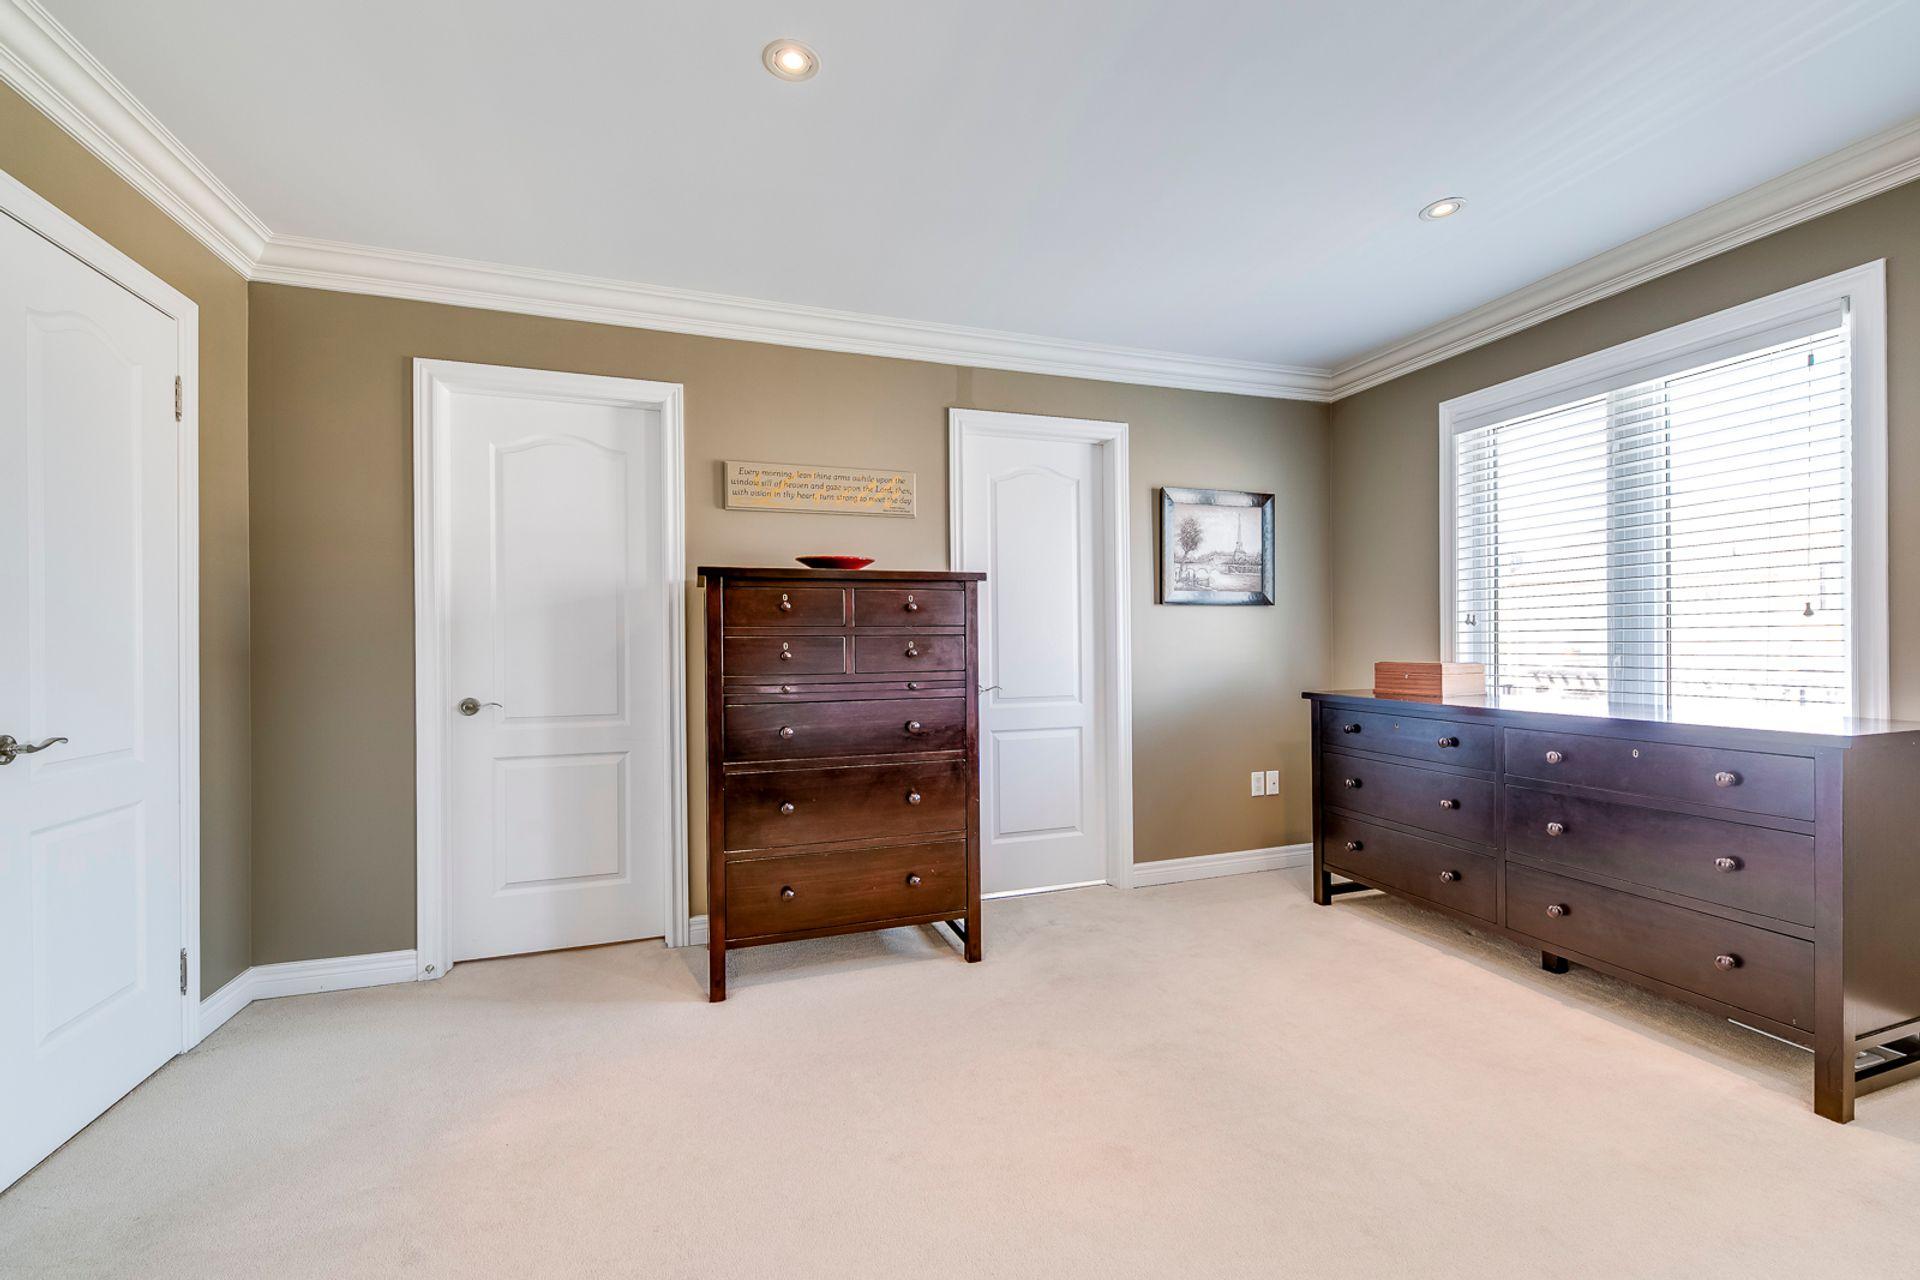 Master Bedroom - 2465 North Ridge Tr, Oakville - Elite3 & Team at 2465 North Ridge Trail, Iroquois Ridge North, Oakville